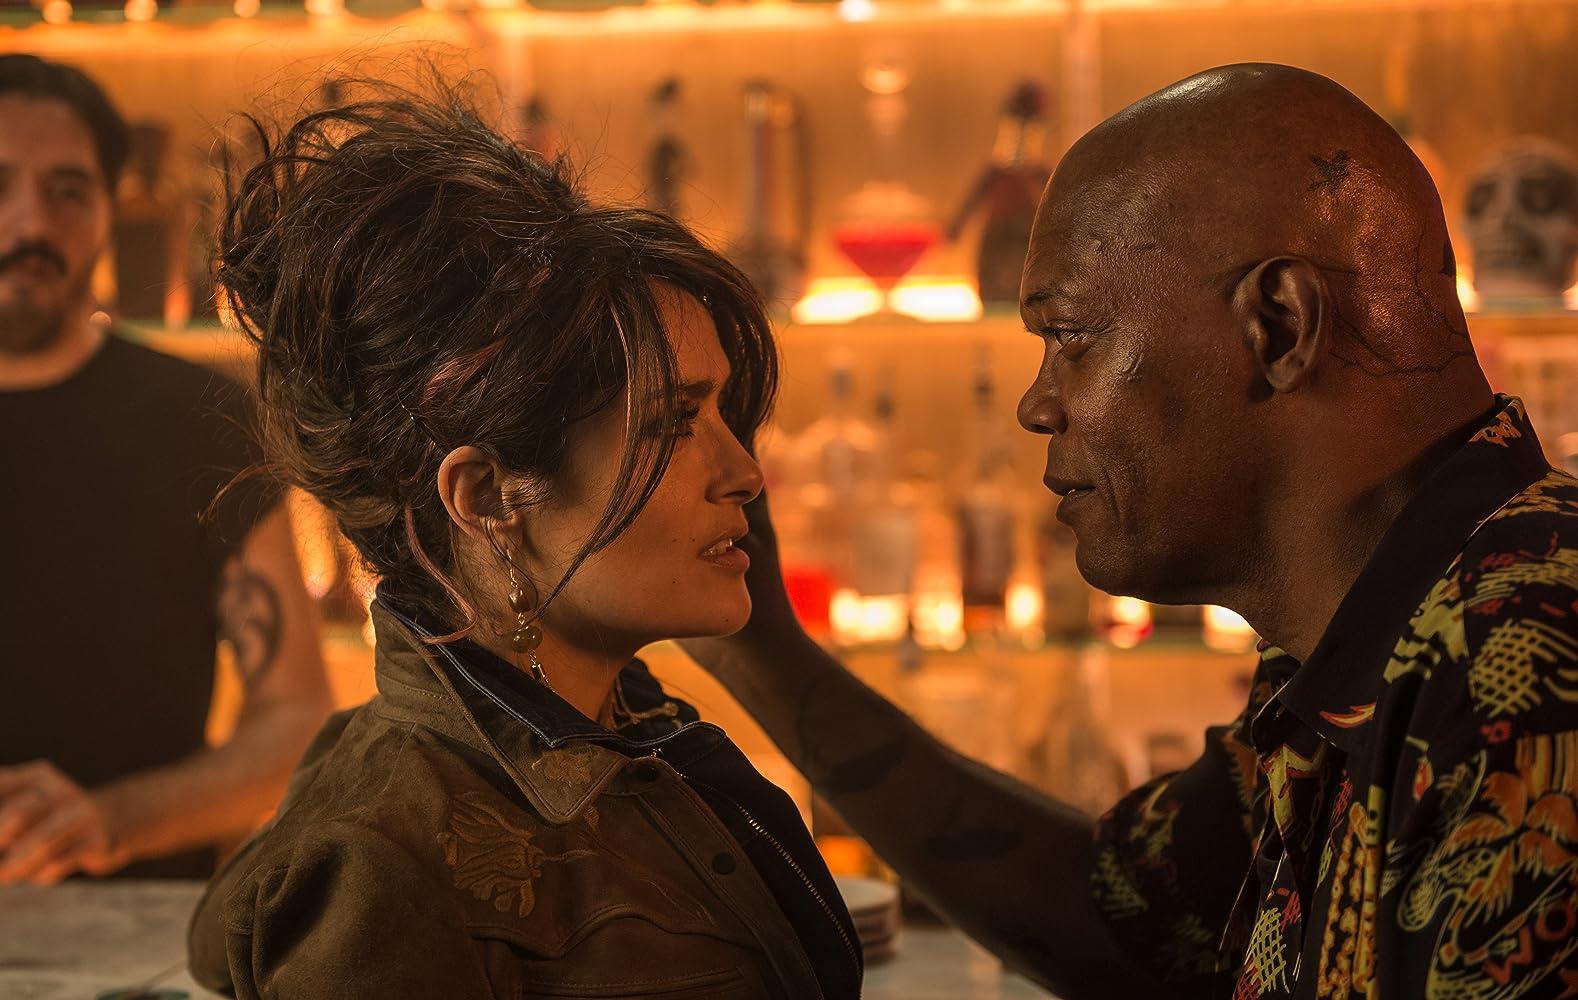 Salma Hayek and Samuel L. Jackson in The Hitman's Bodyguard (2017)